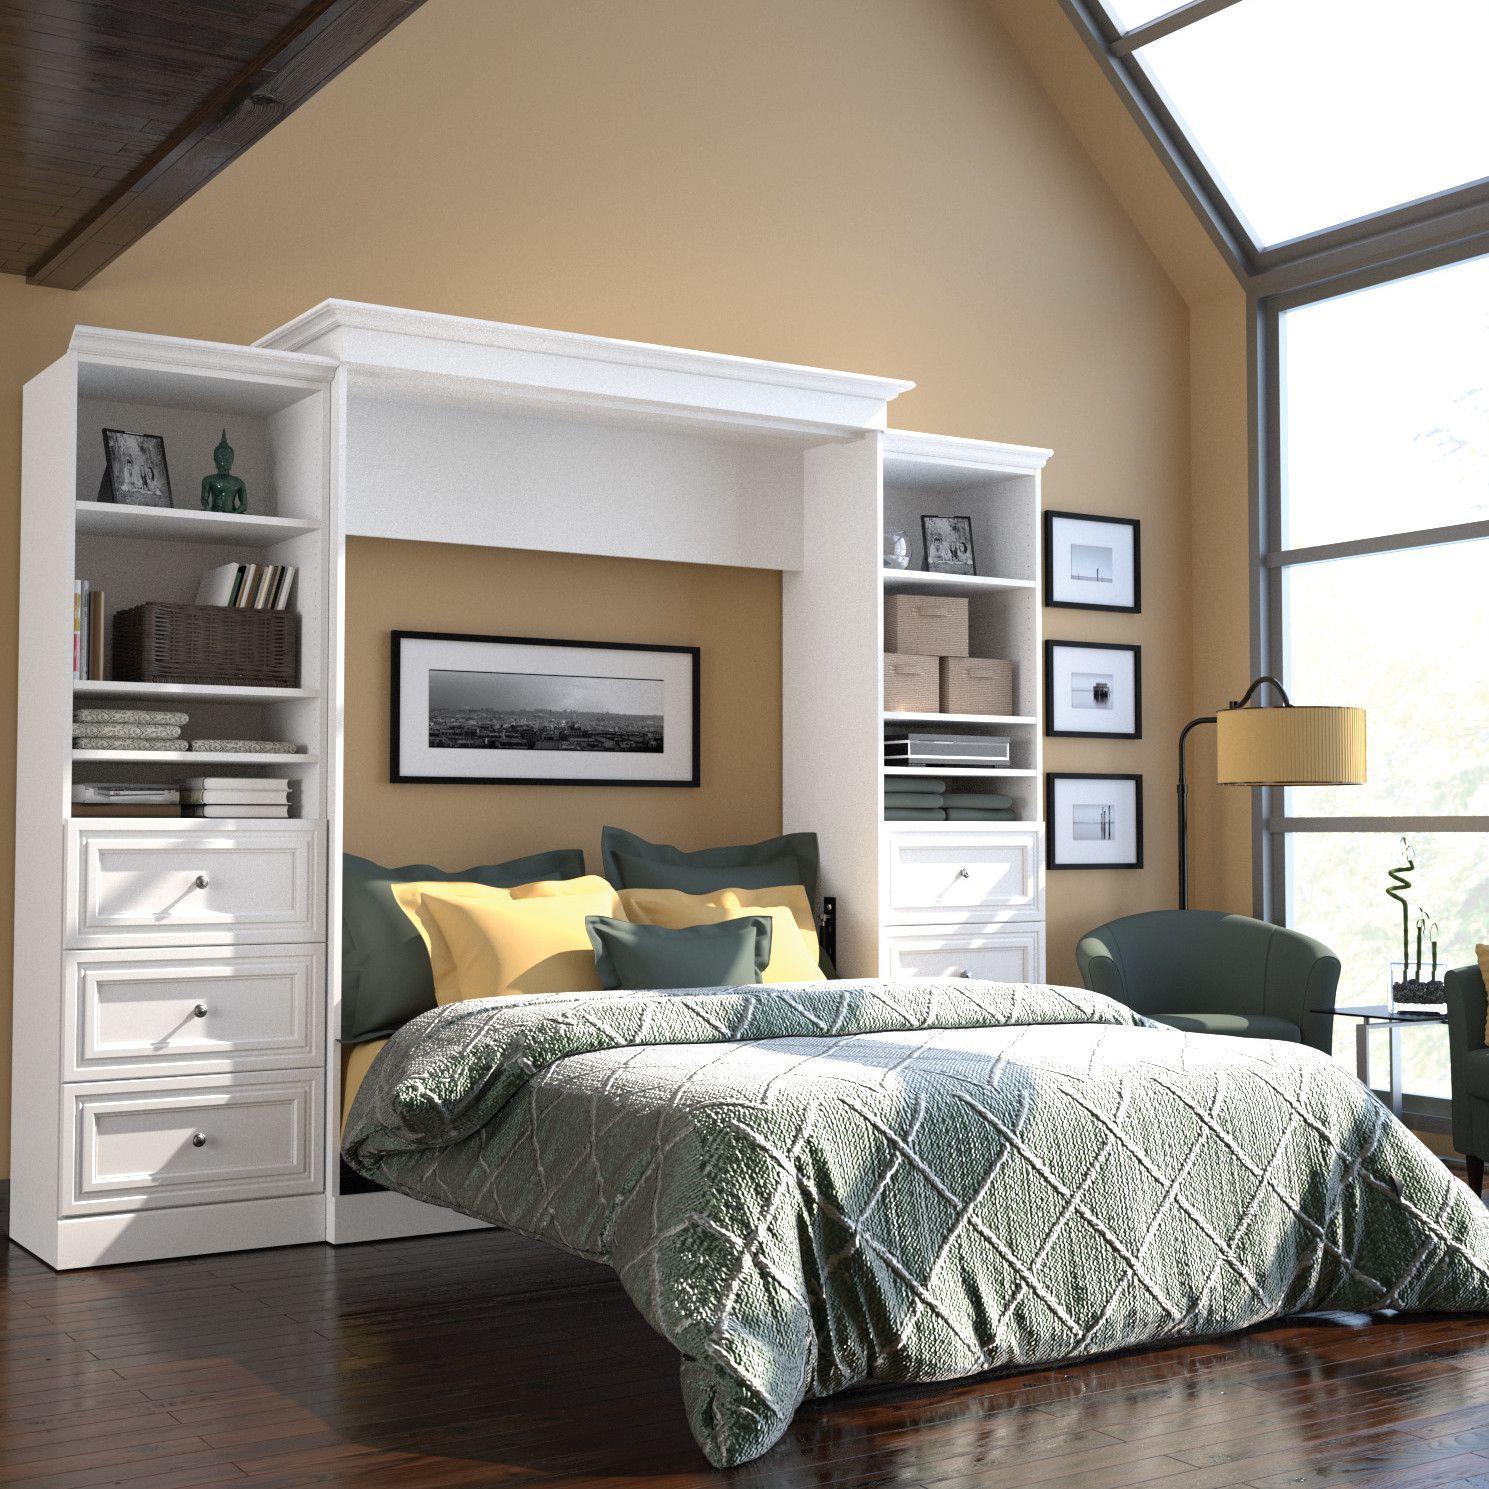 Bestar versatile queen storage wall bed wayfair interior bestar versatile queen storage wall bed wayfair amipublicfo Image collections